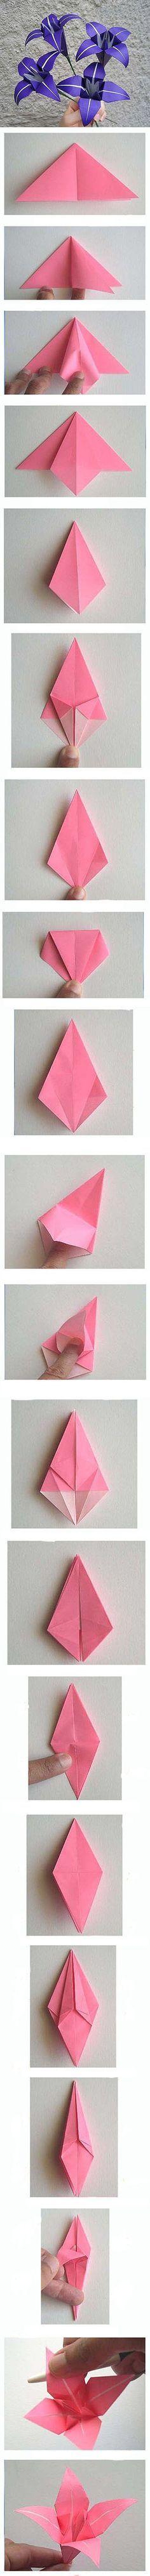 Beautiful Paper Flower   DIY & Crafts Tutorials